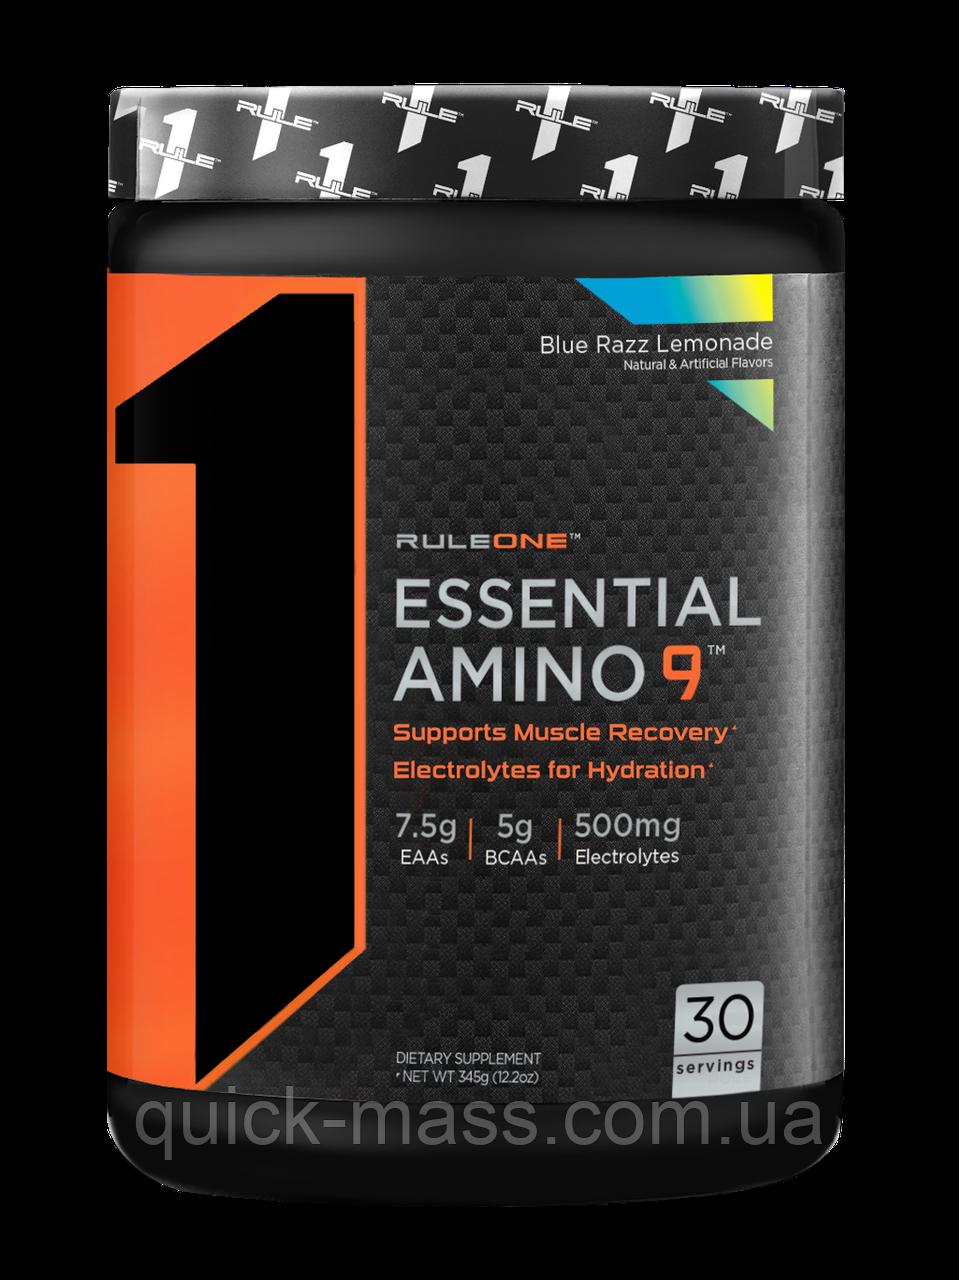 Аминокислоты Rule One Essential Amino 9 345g